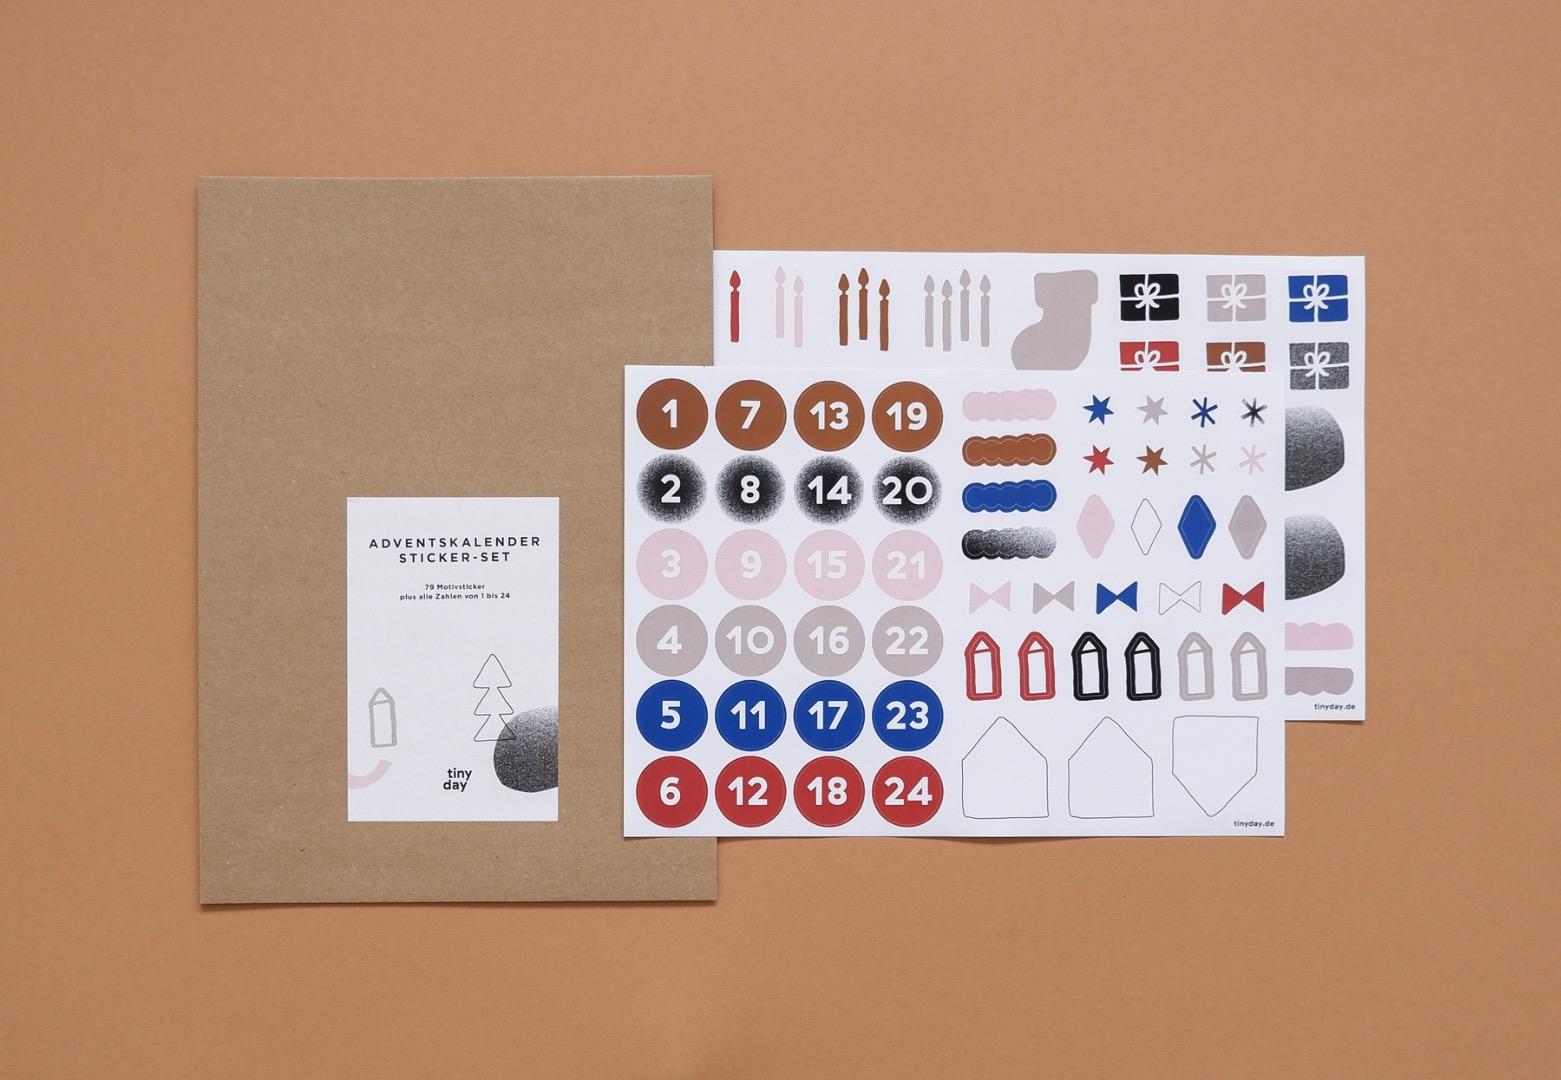 Adventskalender Sticker-Set